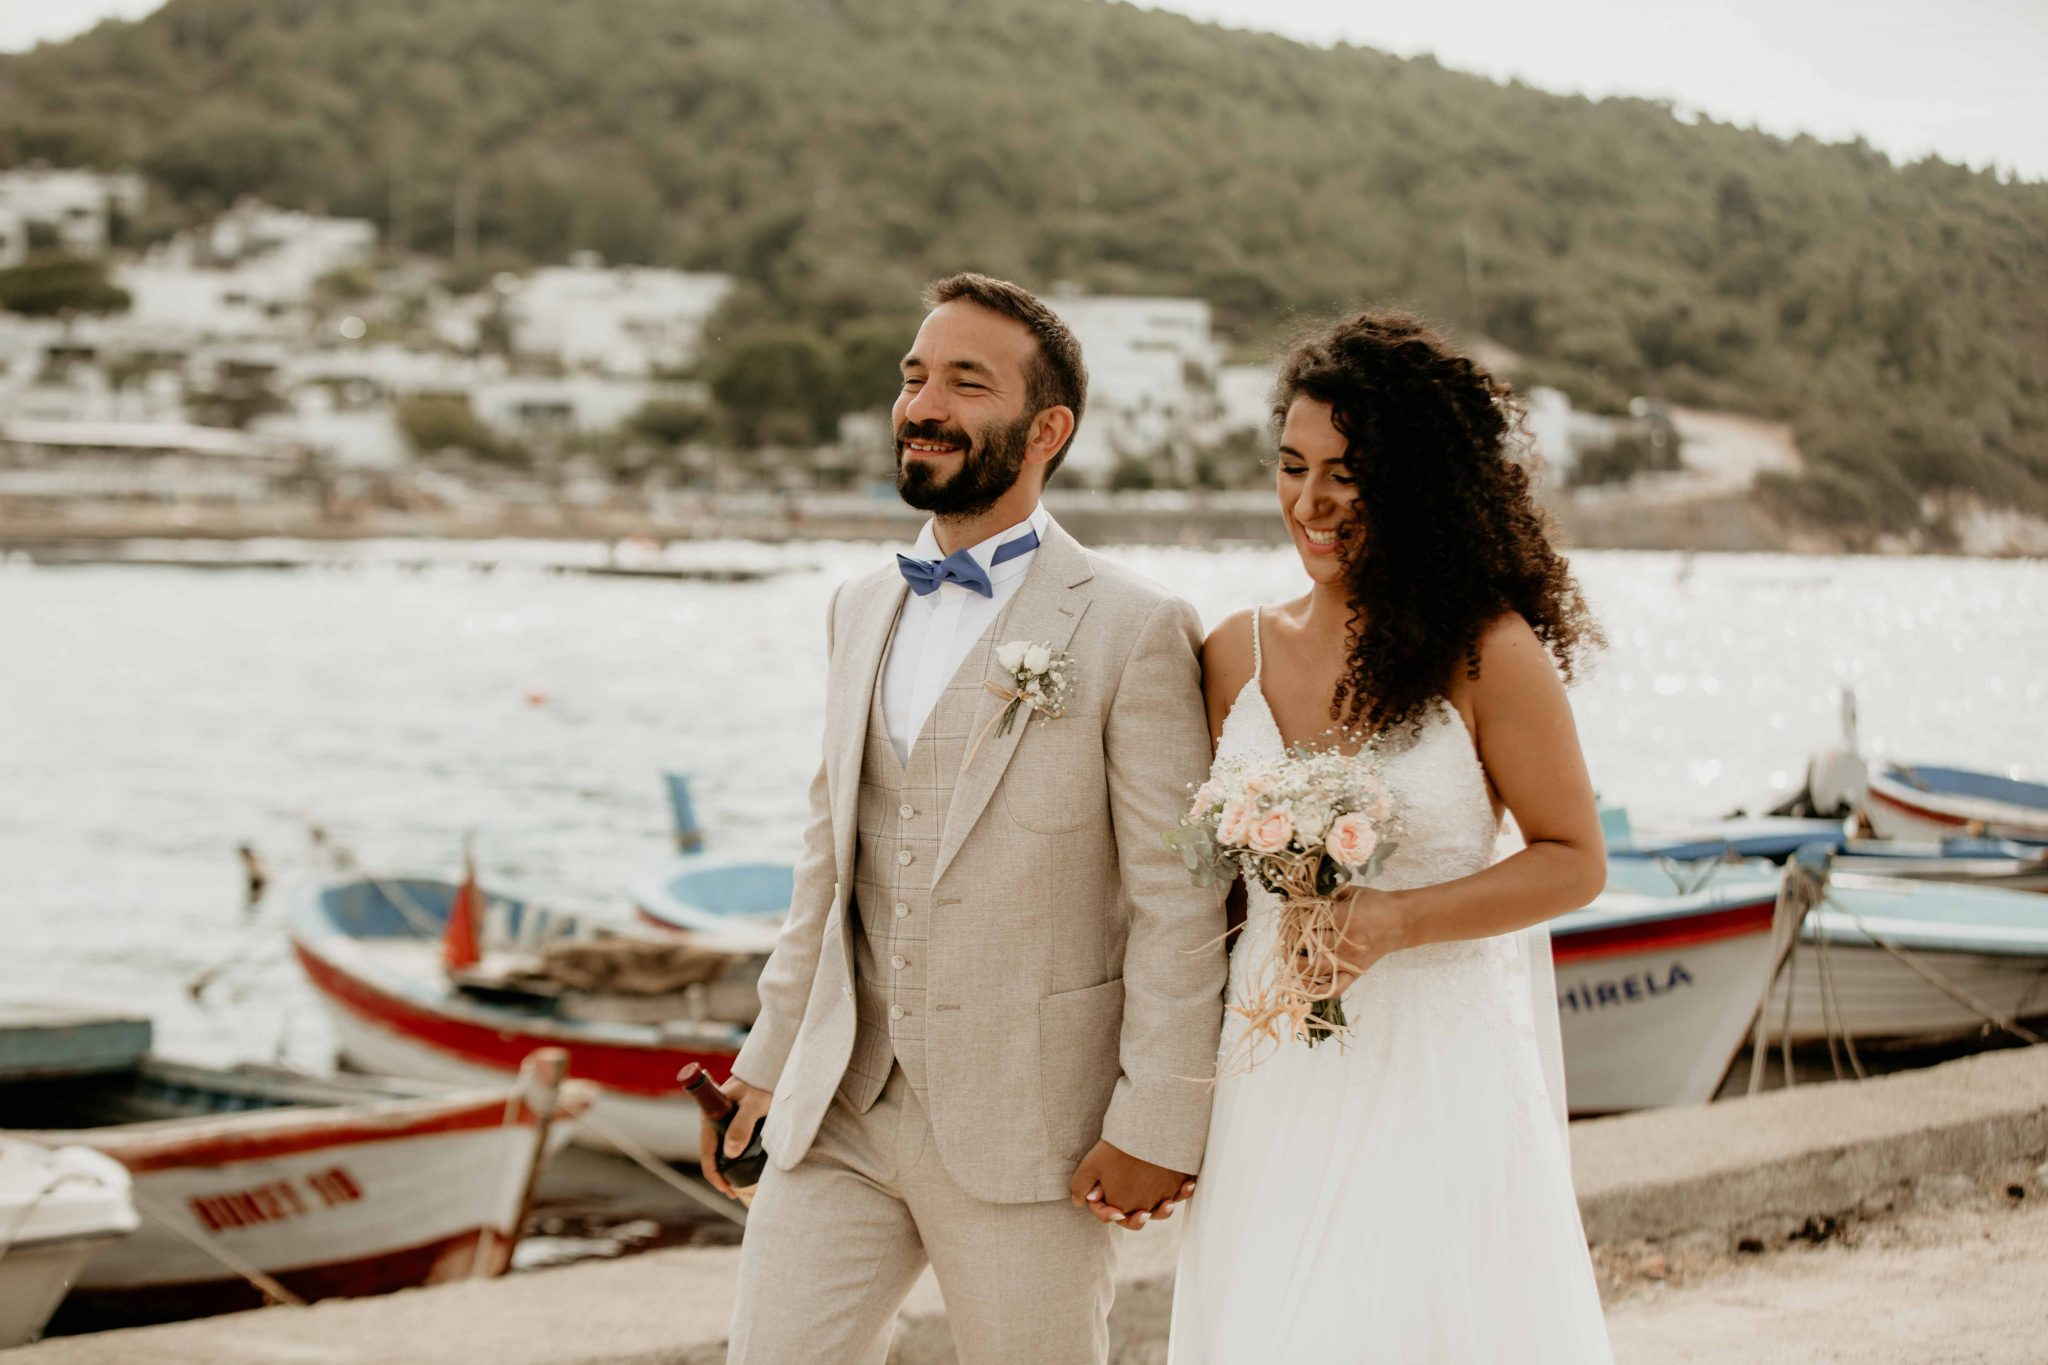 Ruken & Alper Düğün Hikayesi